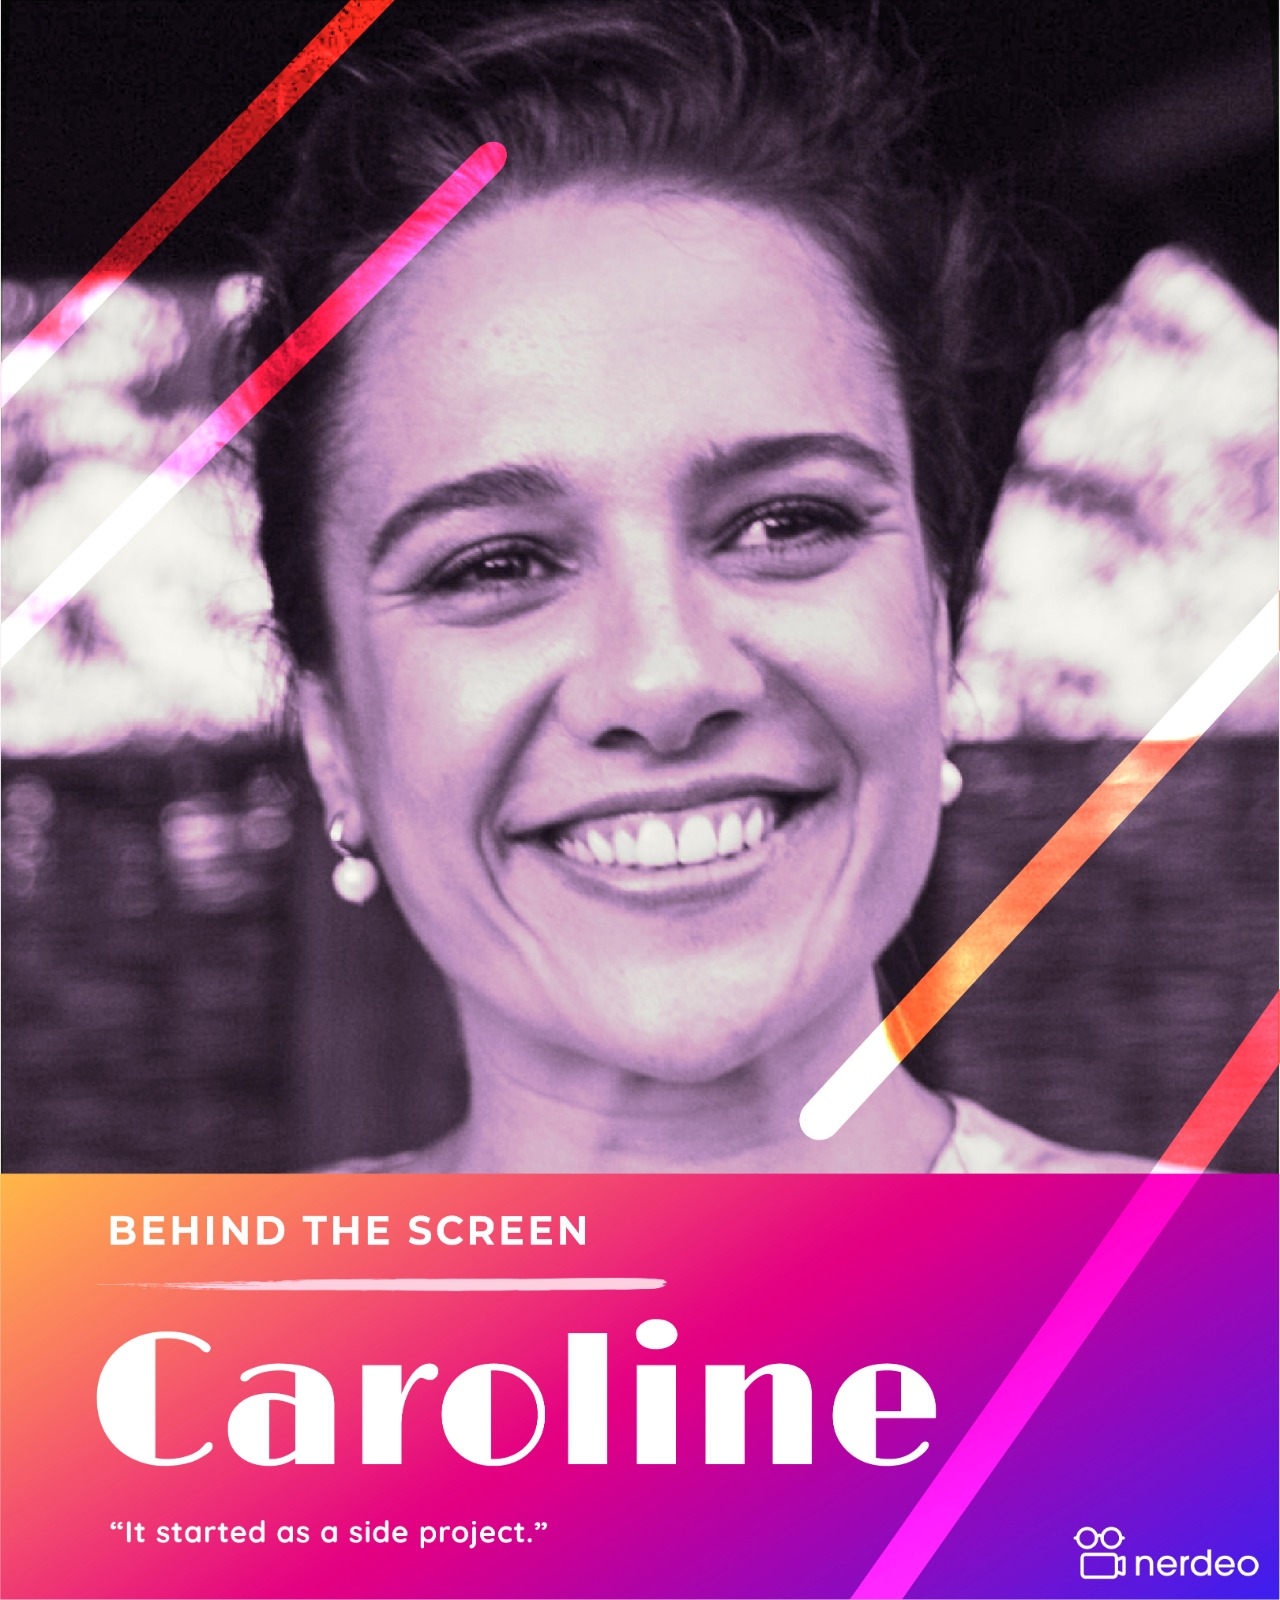 Caroline Pires CEO